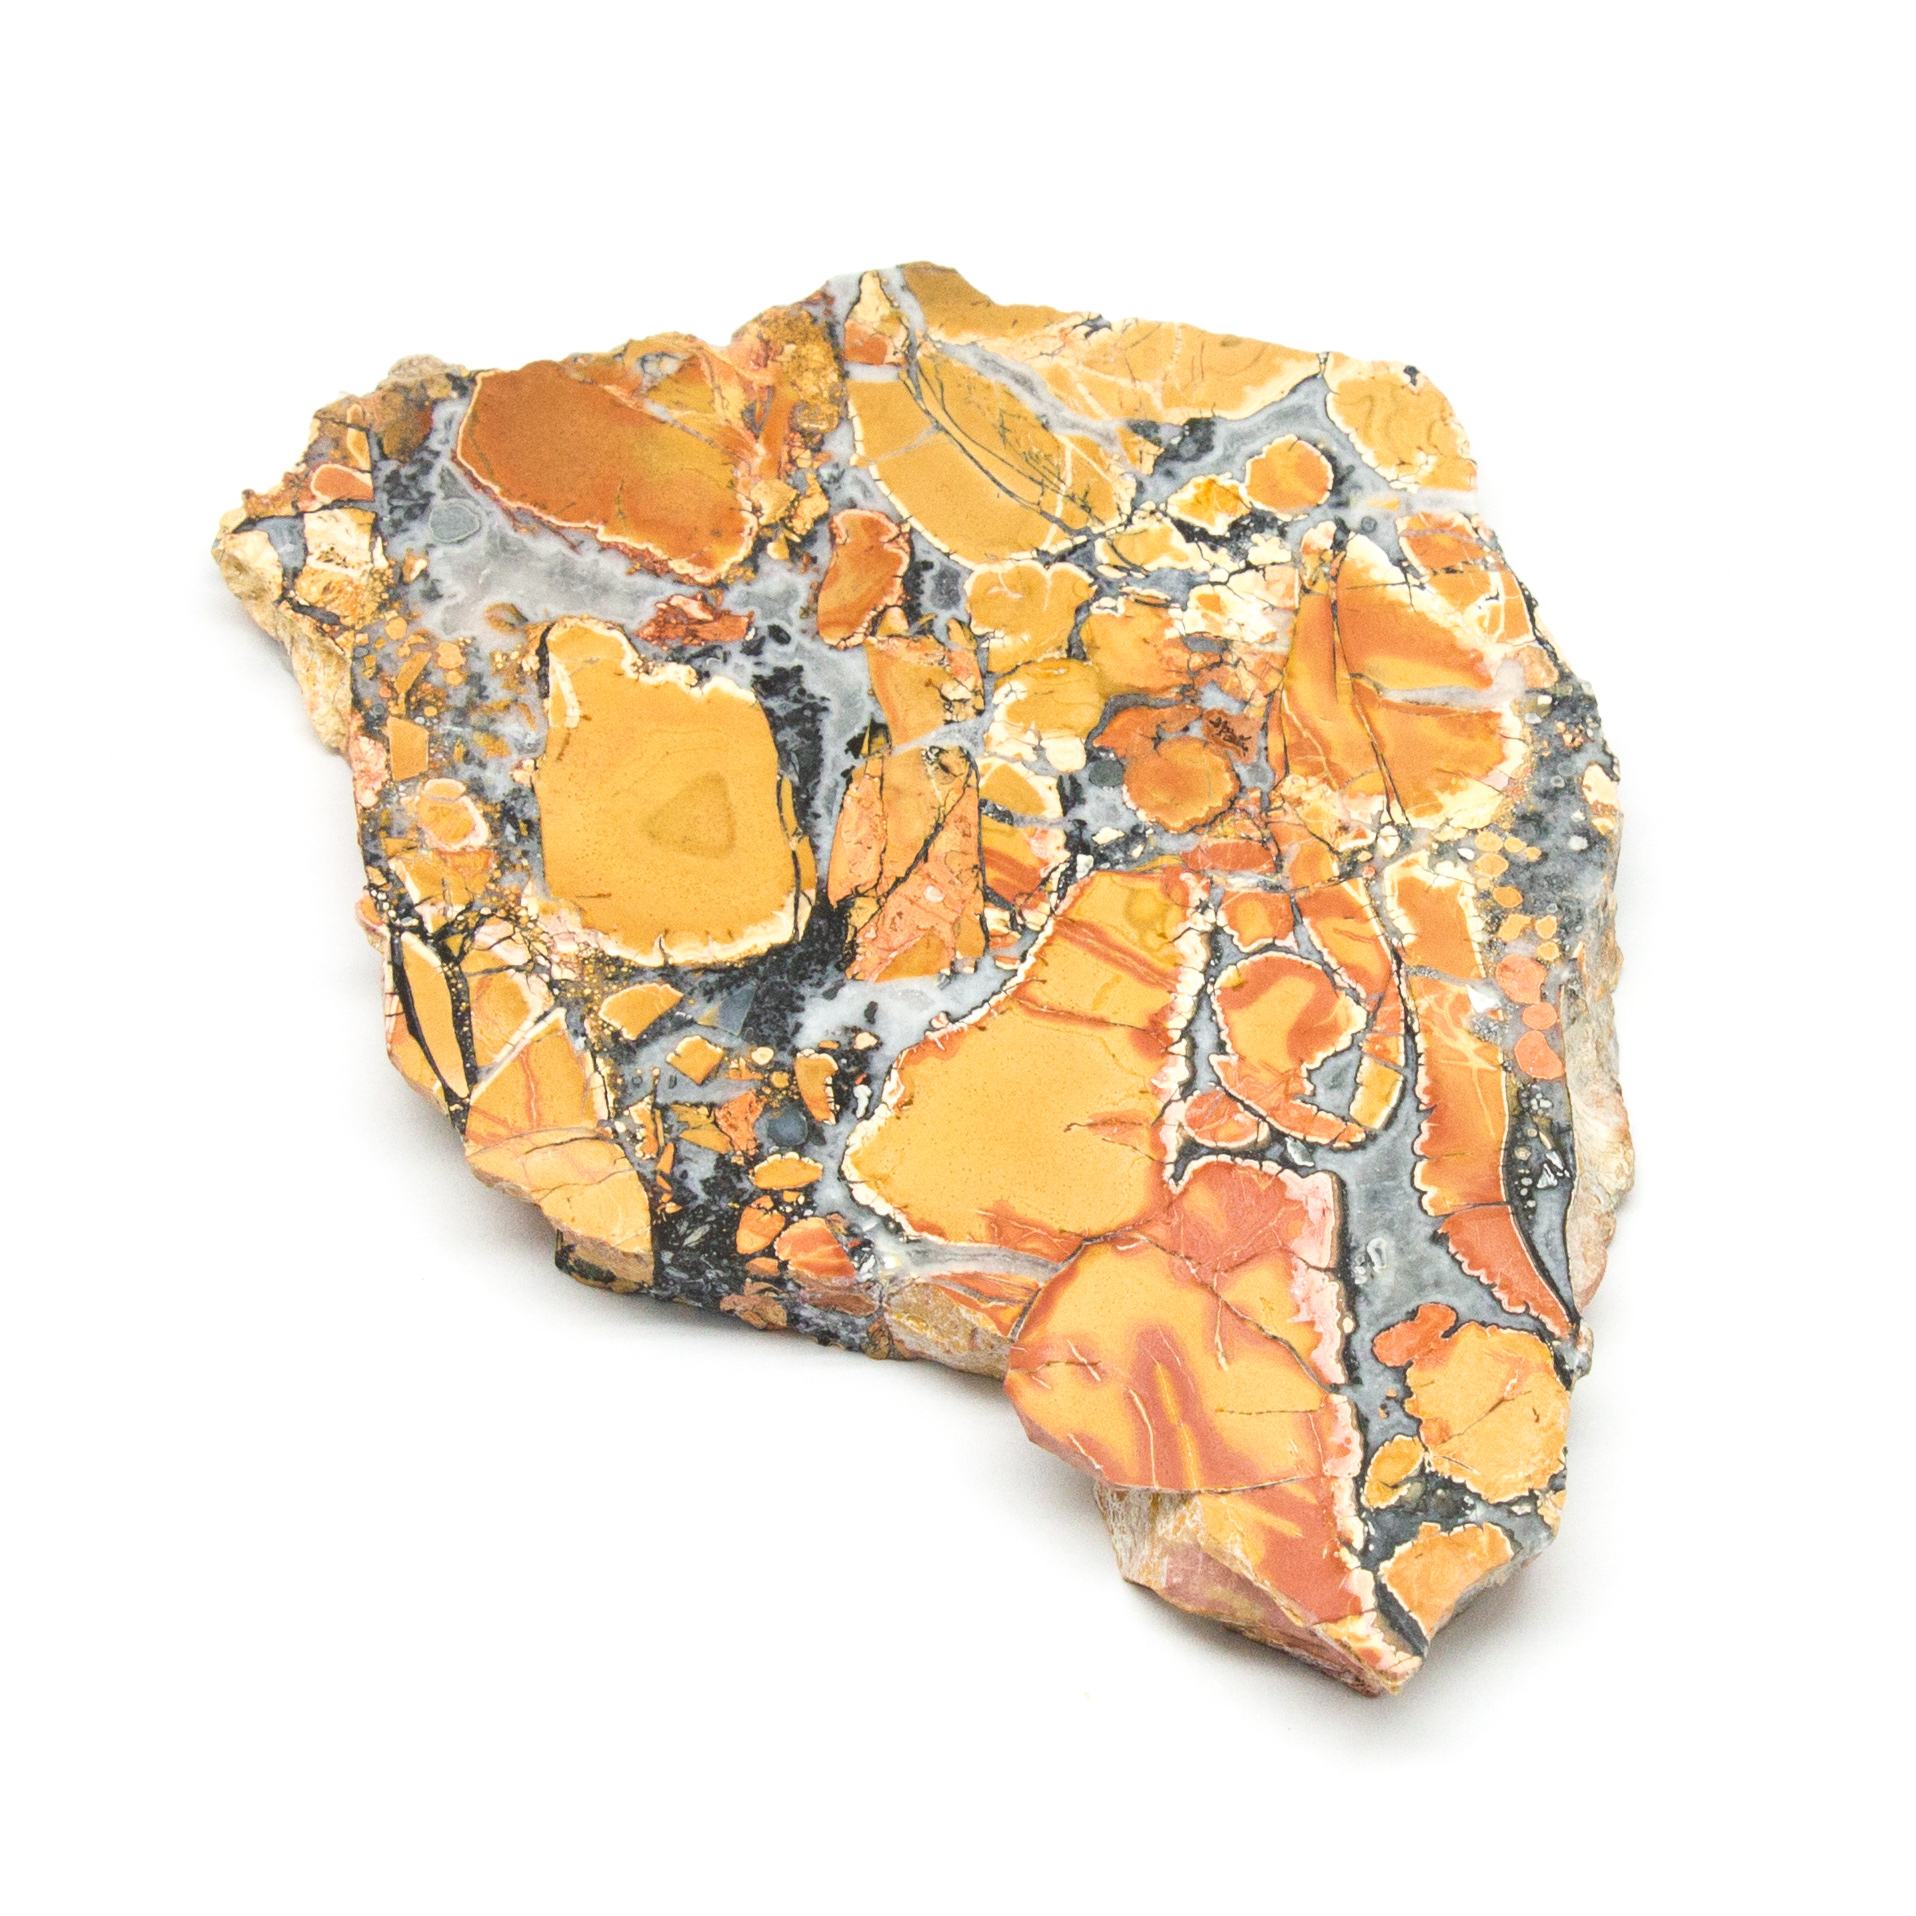 lovely gray and yellow Maligano Jasper oval cabochon 62.51 carats     044-10-005